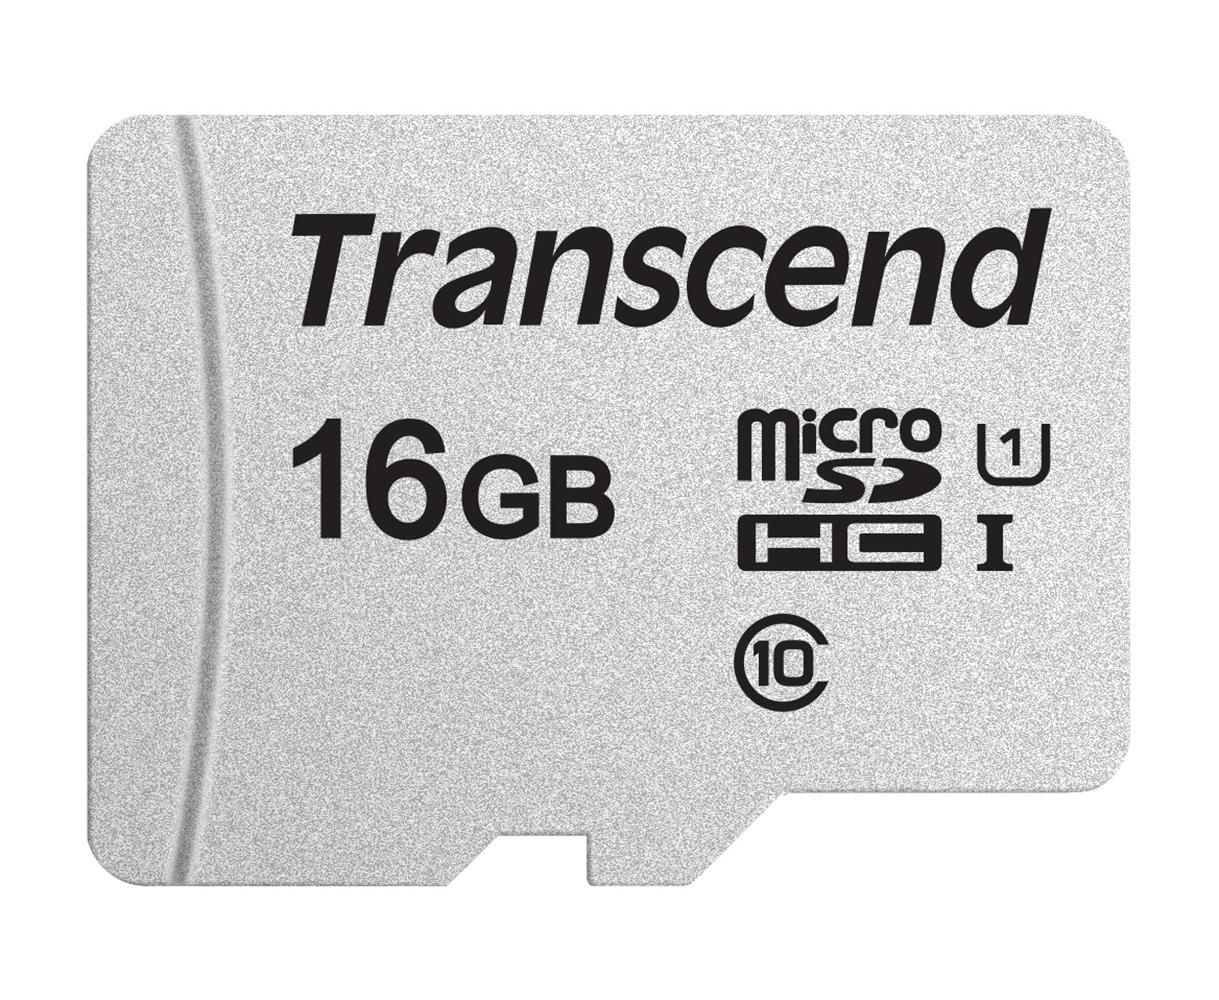 TS16GUSD300S [16GB]